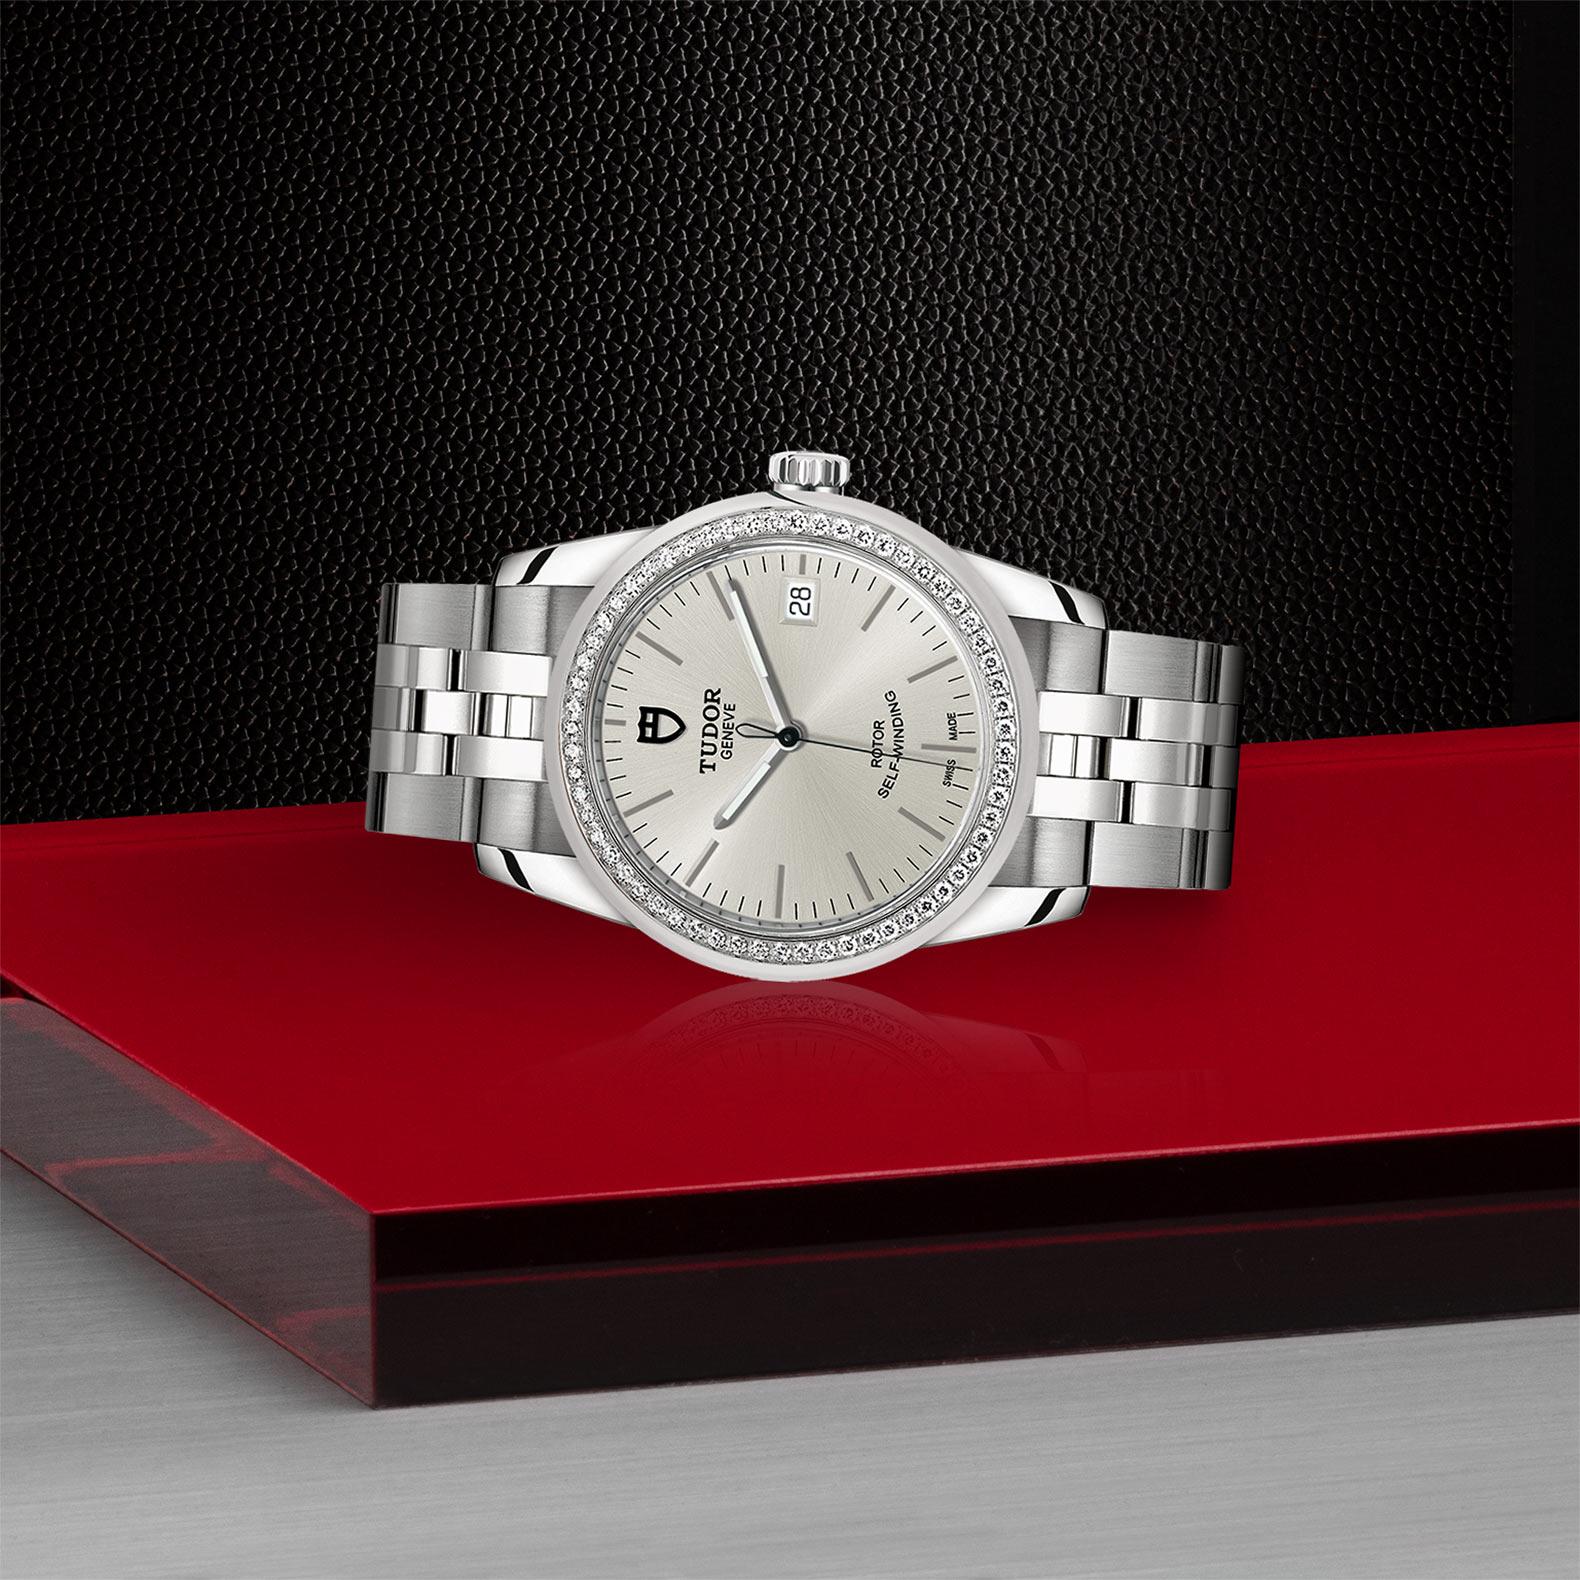 TUDOR Glamour Date - M55020-0004